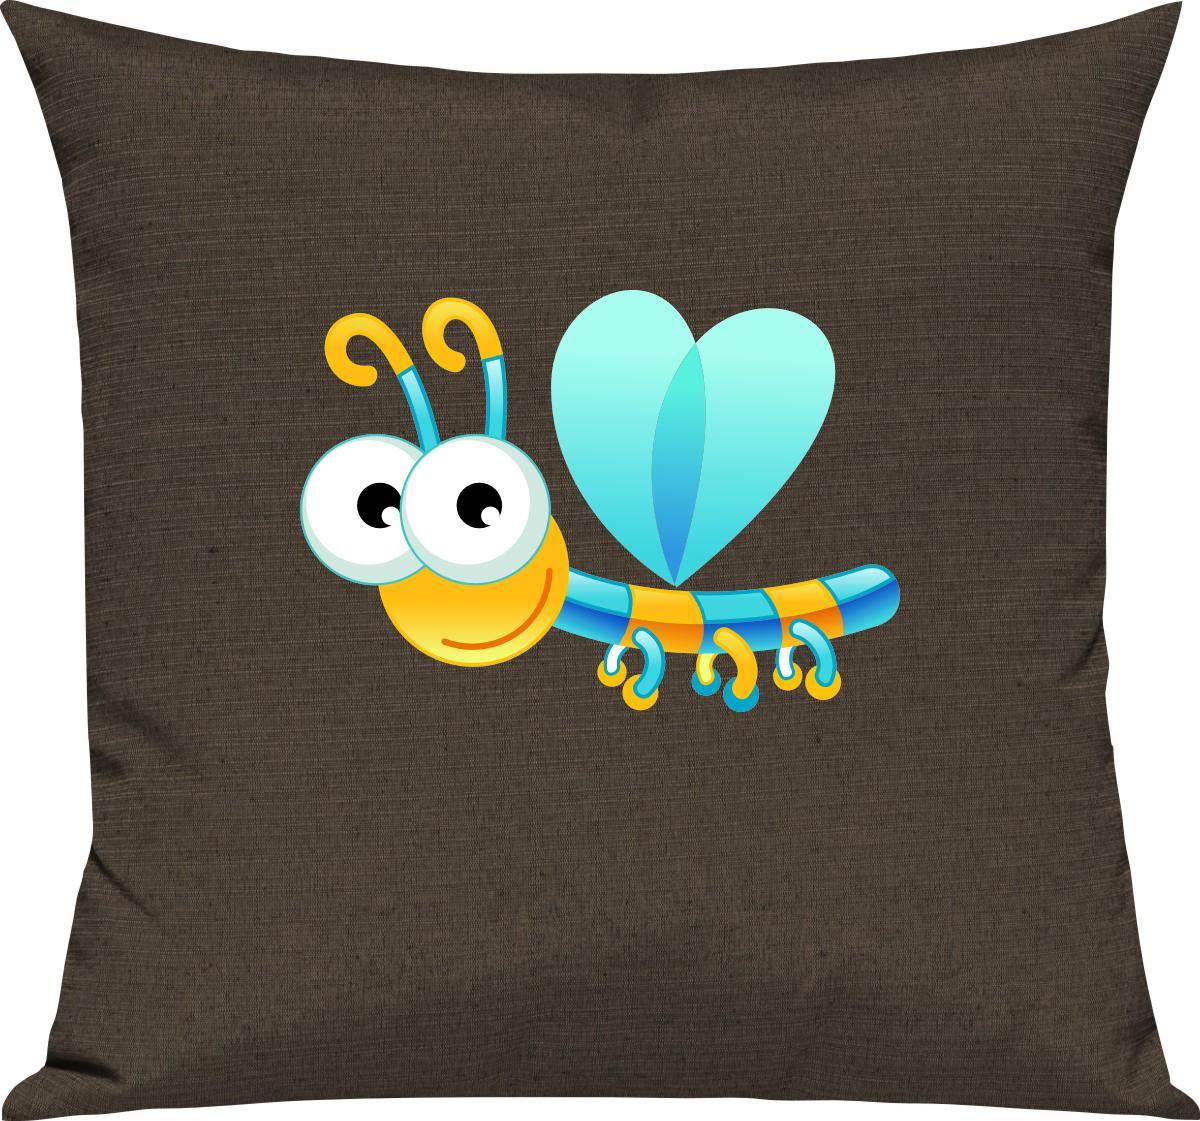 Indexbild 3 - Kinder Kissen, Libelle Insekt Tiere Tier Natur, Kuschelkissen Couch Deko,